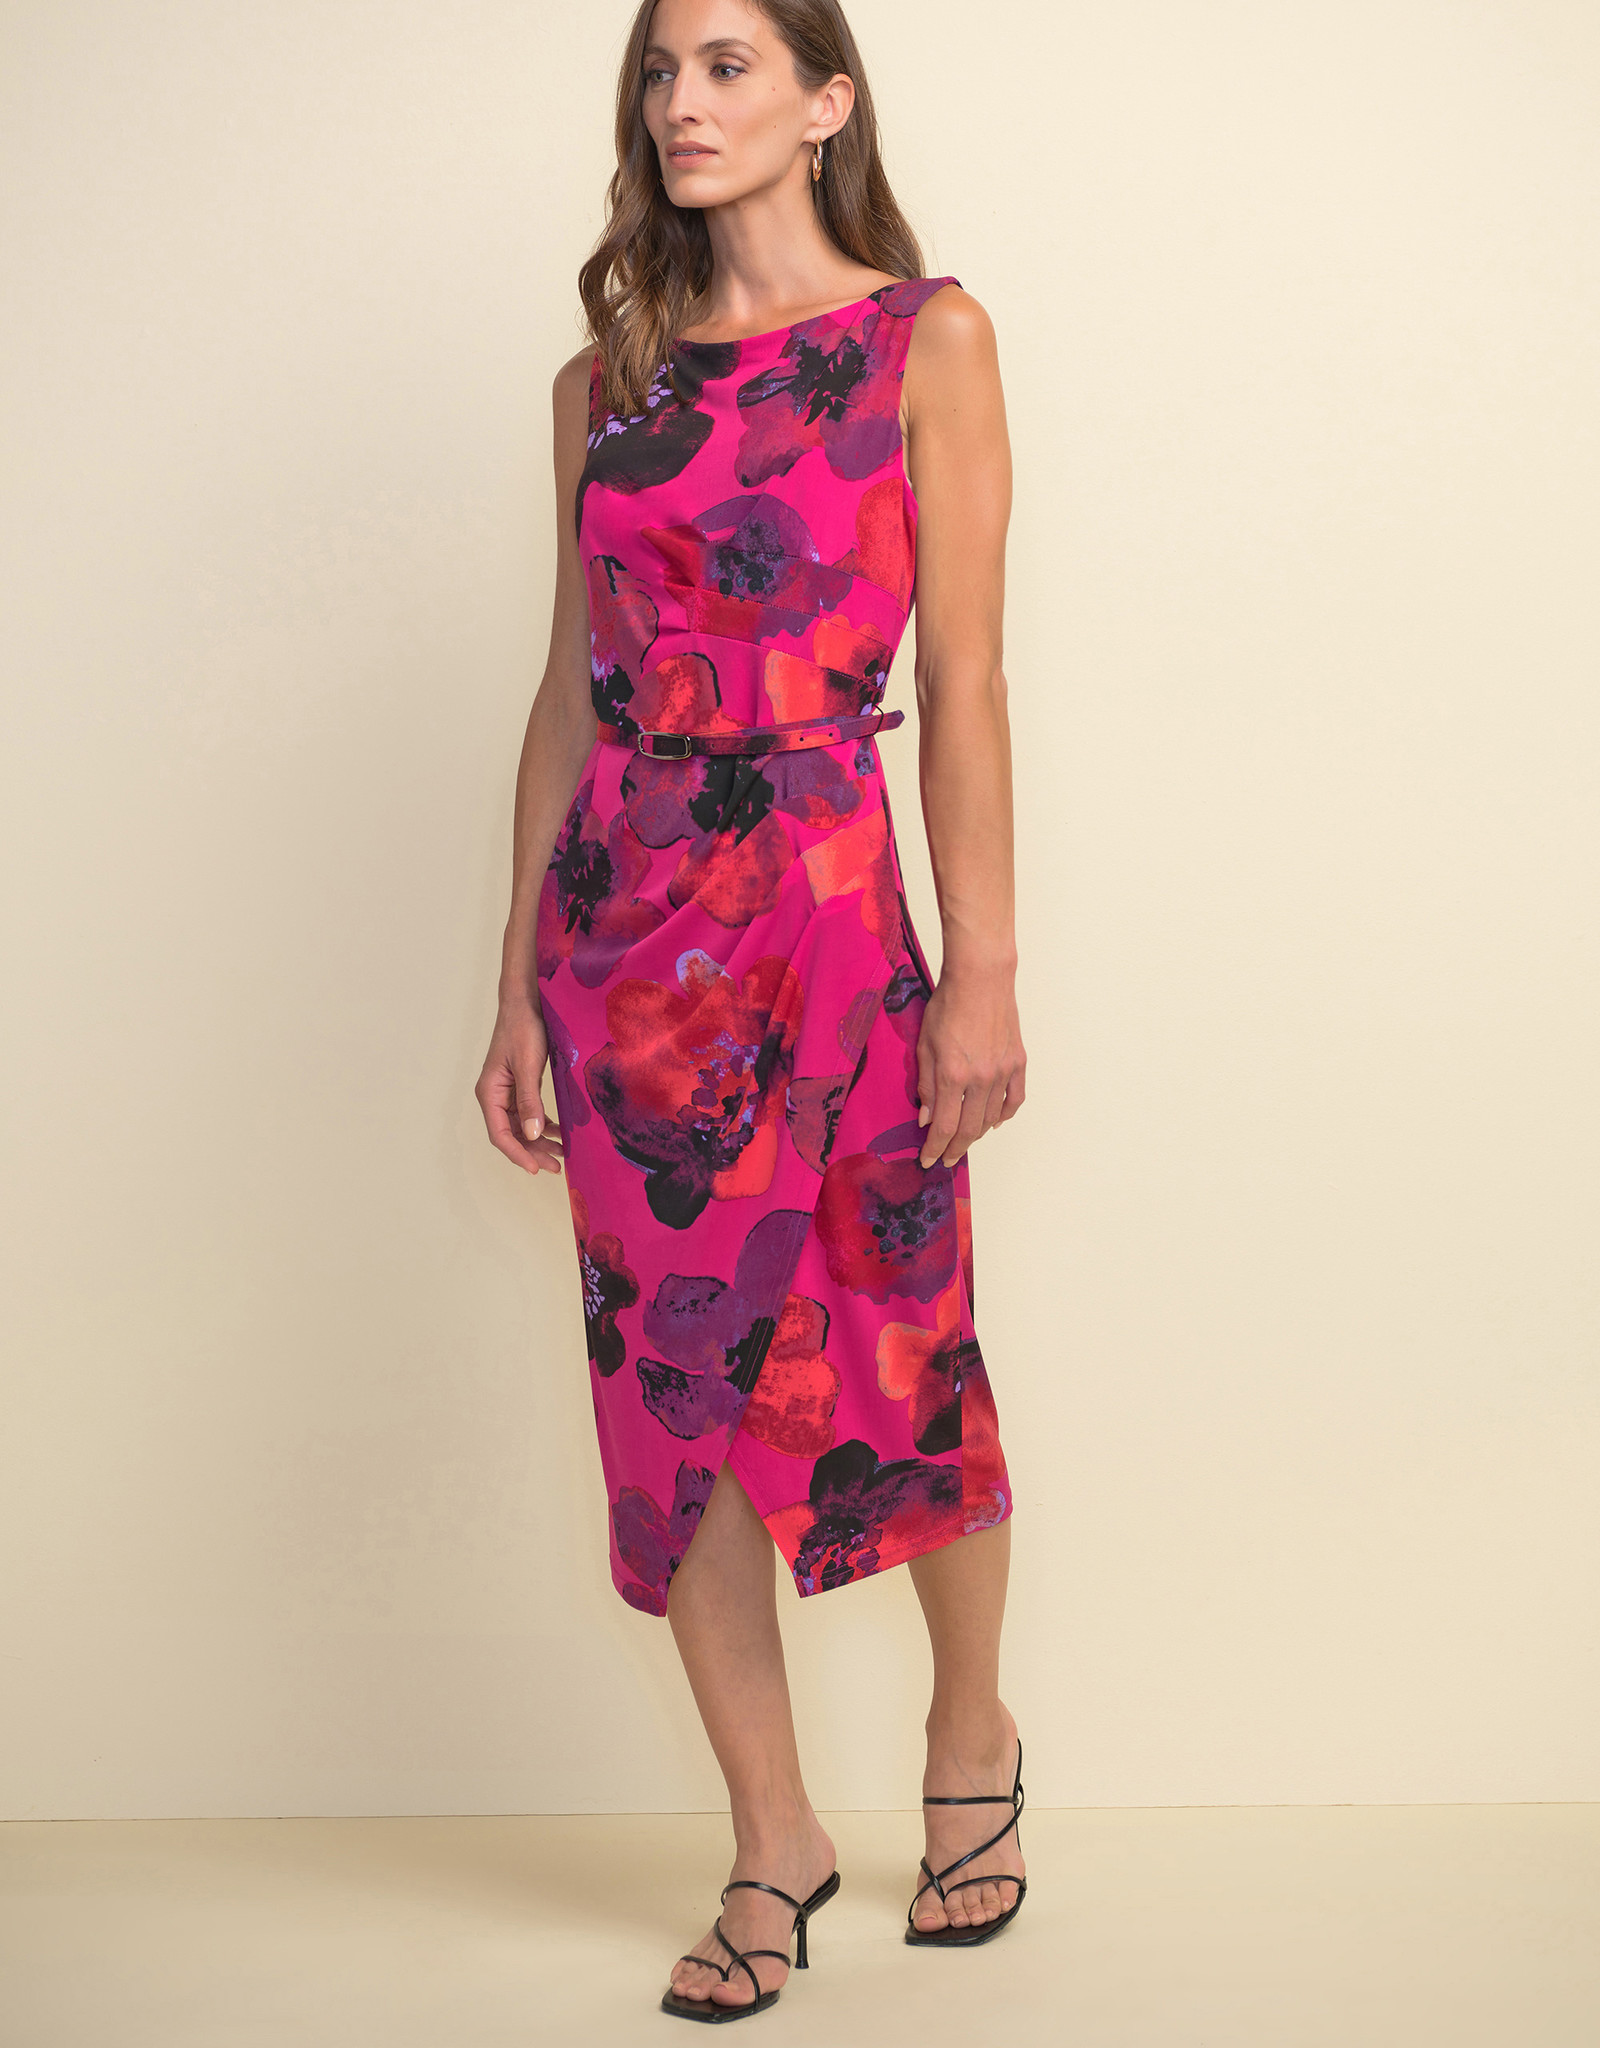 Joseph Ribkoff Joseph Ribkoff  211351 Sleeveless Dress with a Floral Pattern and Belt